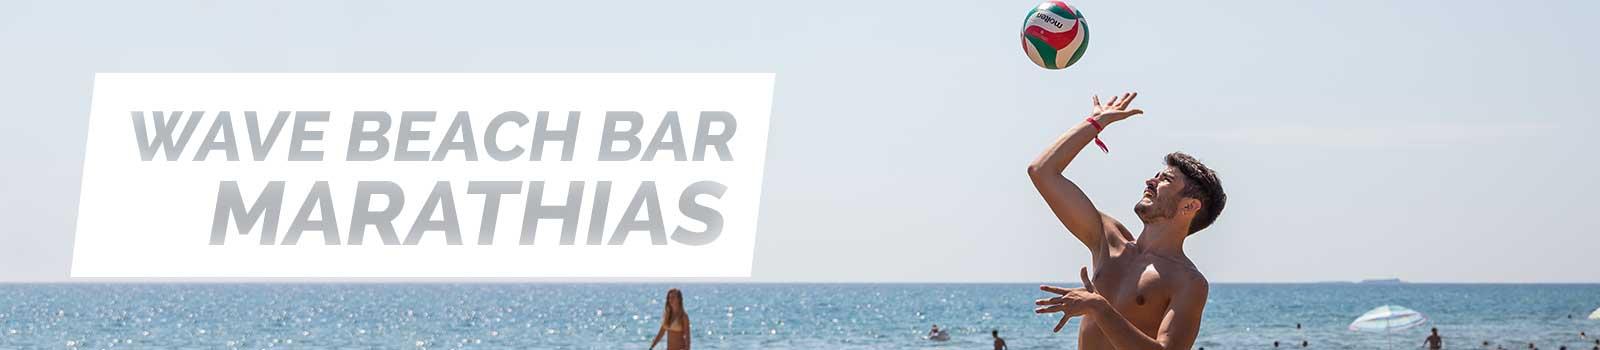 corfu-b5-wave-beach-marathias-ok